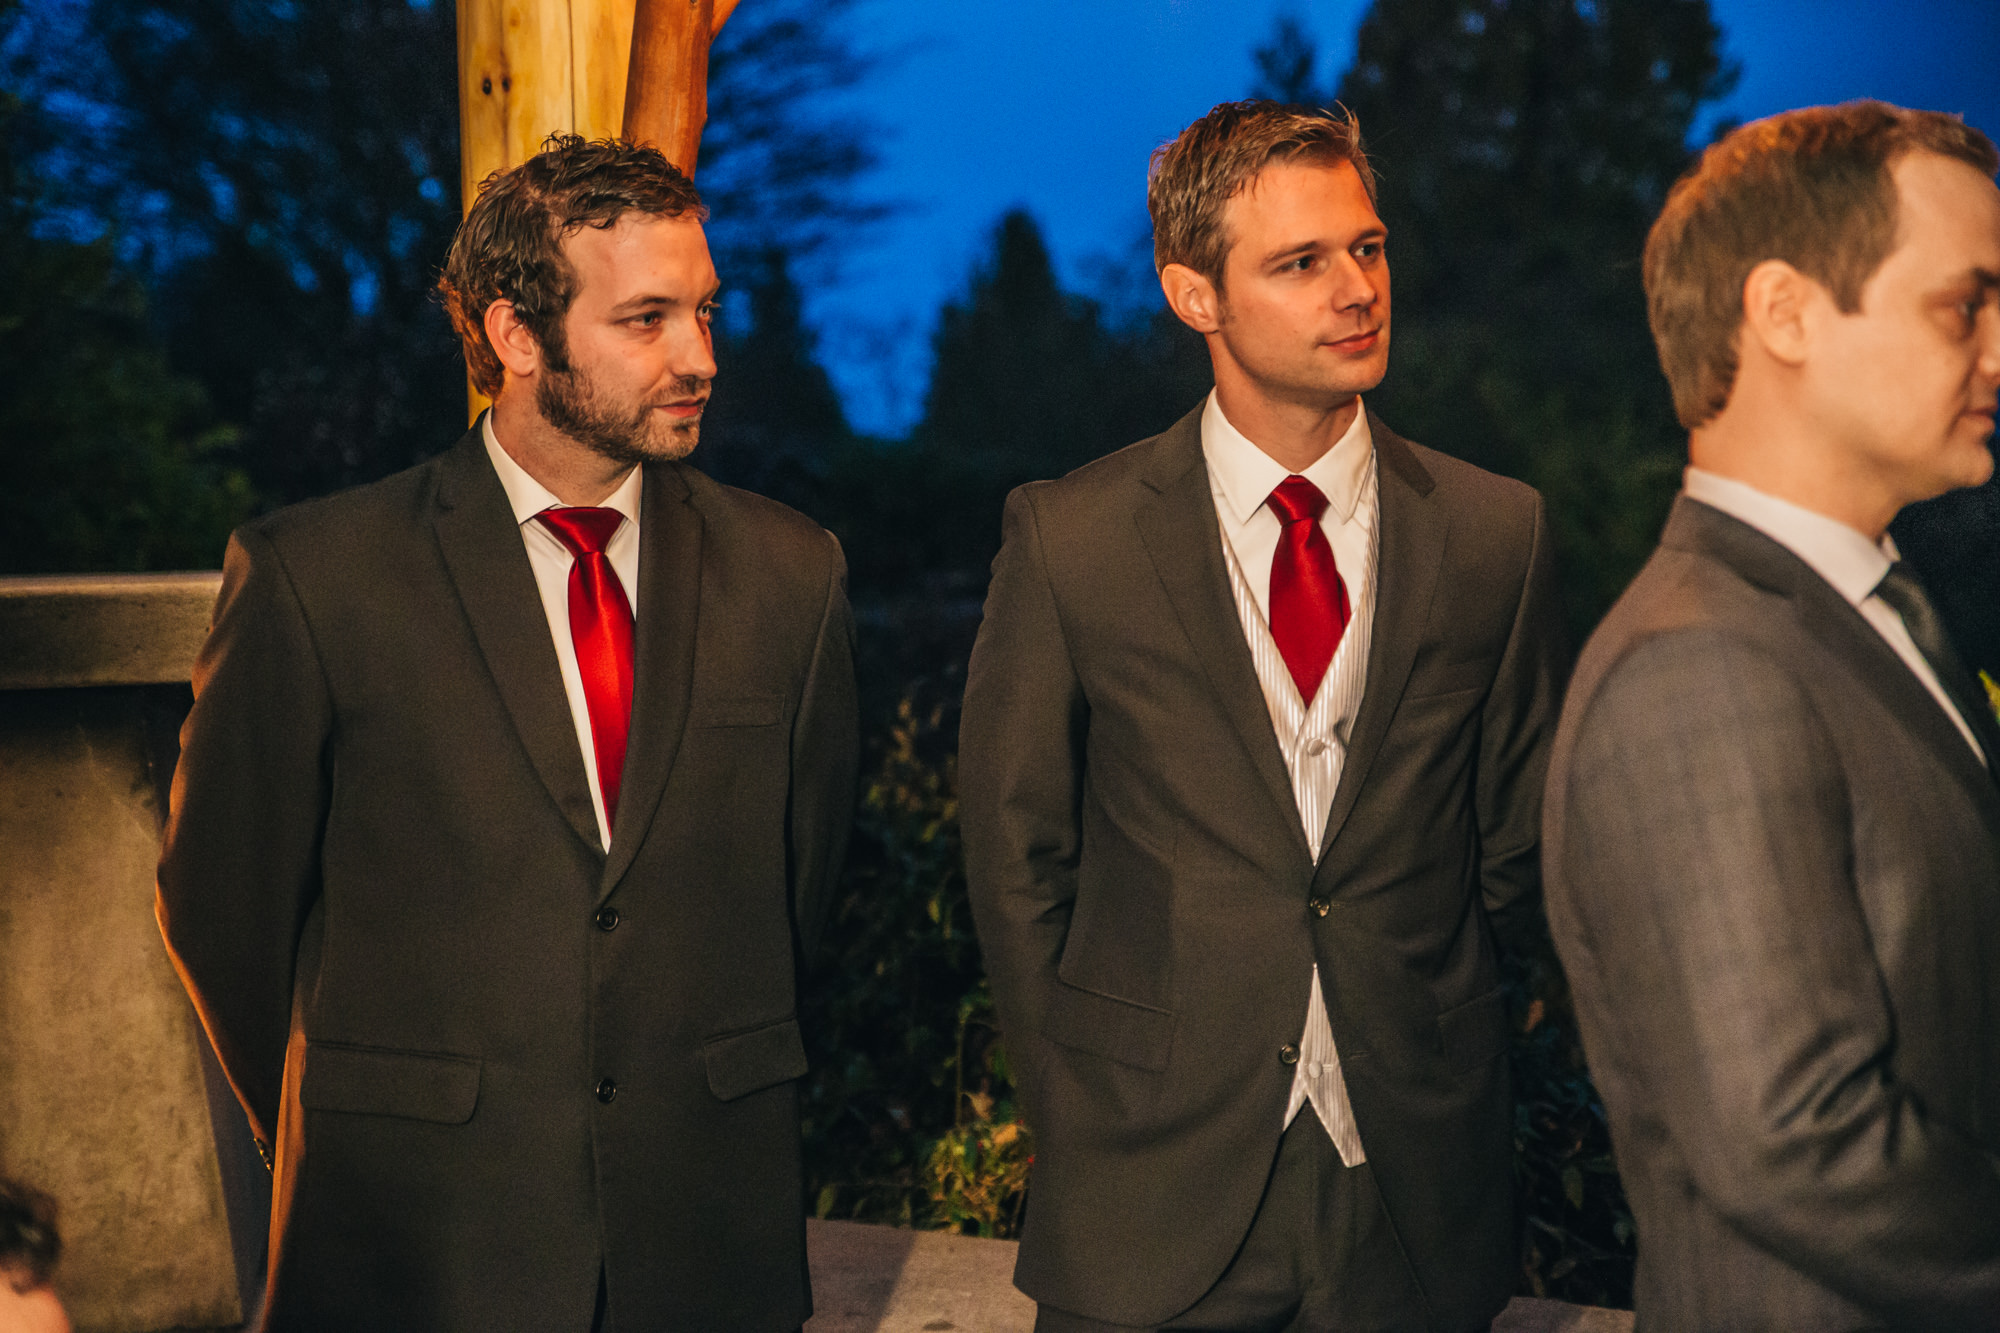 27-seasons-in-the-park-wedding-ceremony.jpg